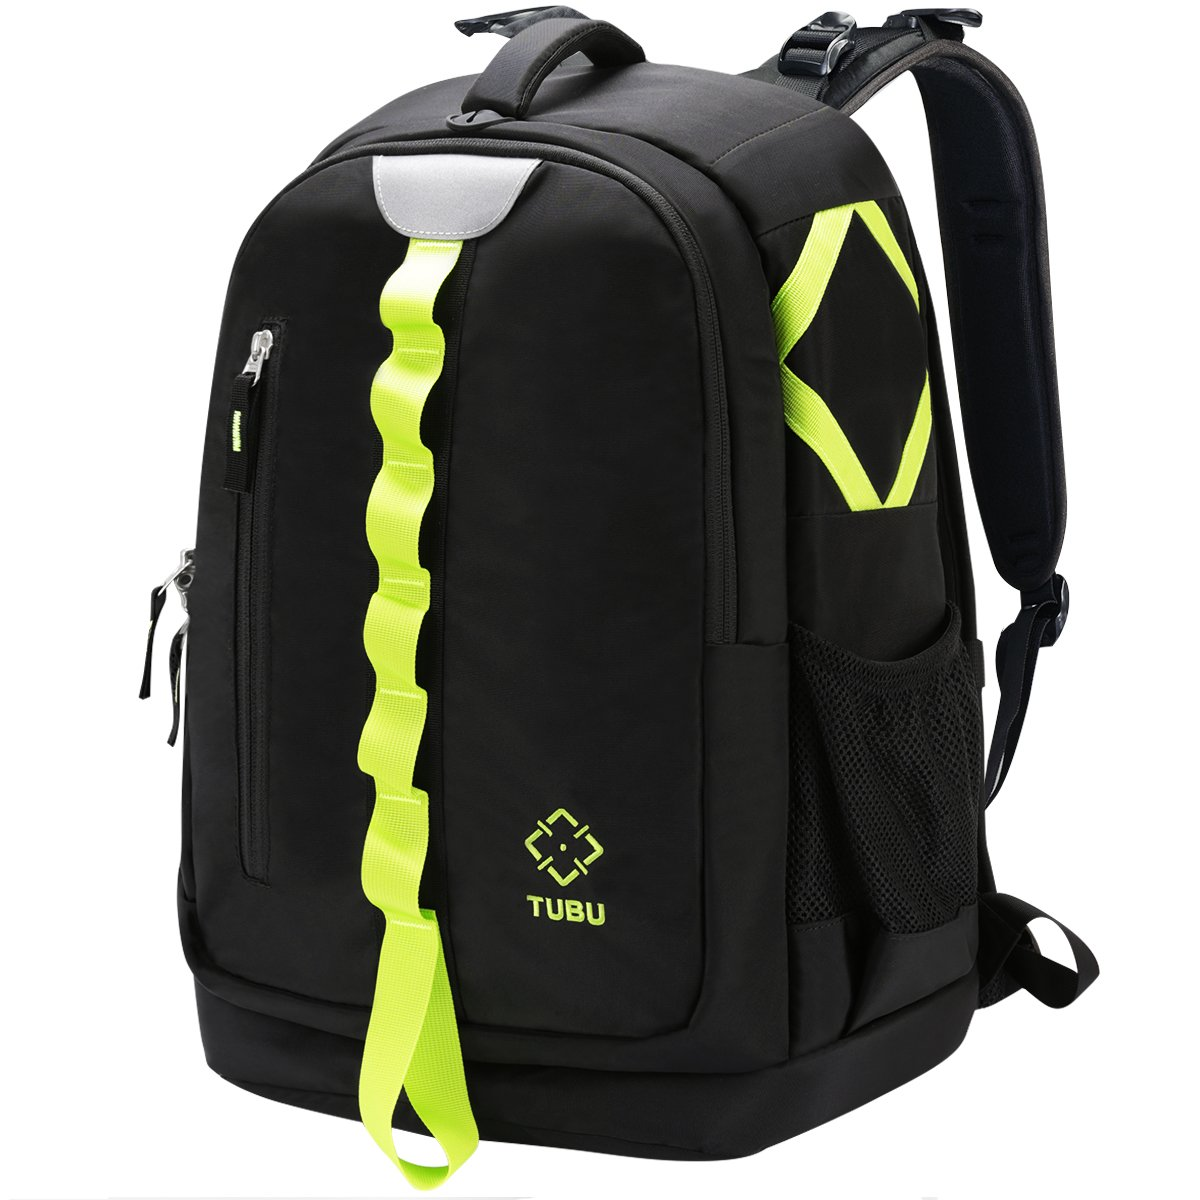 DSLR Camera Backpack Bag Photography Backpack By TUBU Fits 2 DSLR Body, 4-6 Lenses and 14 inch Laptop